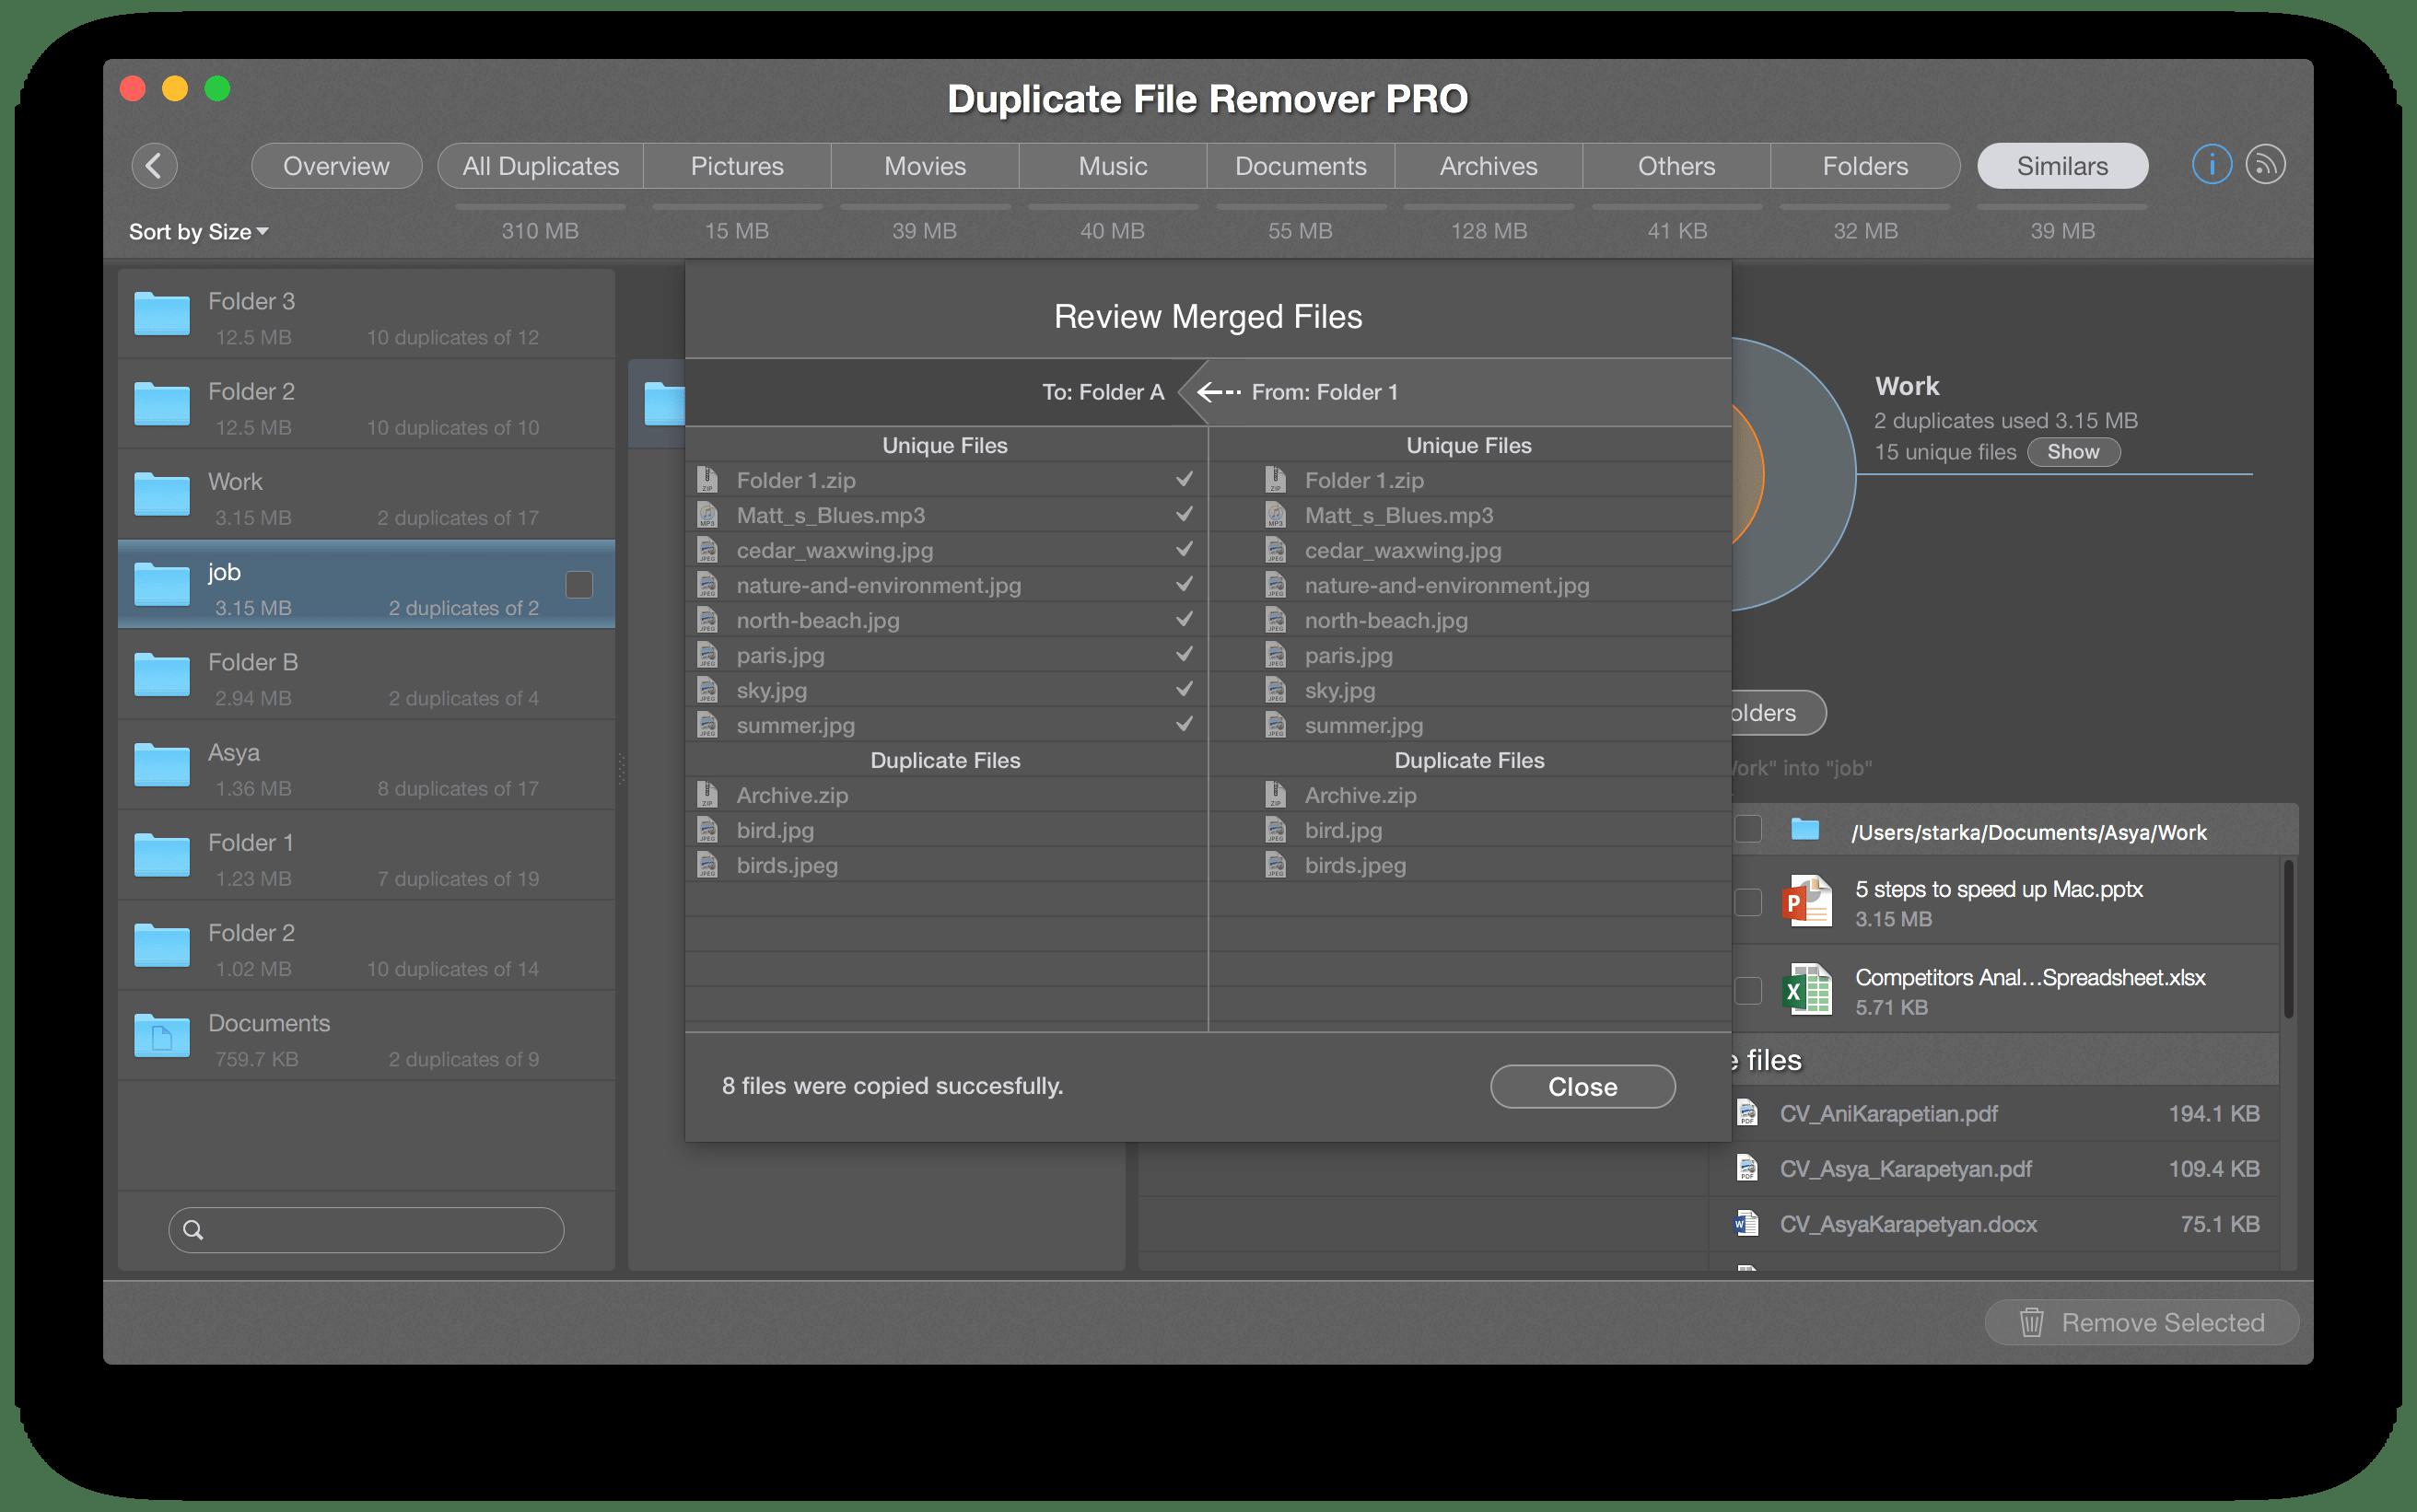 merge folders results